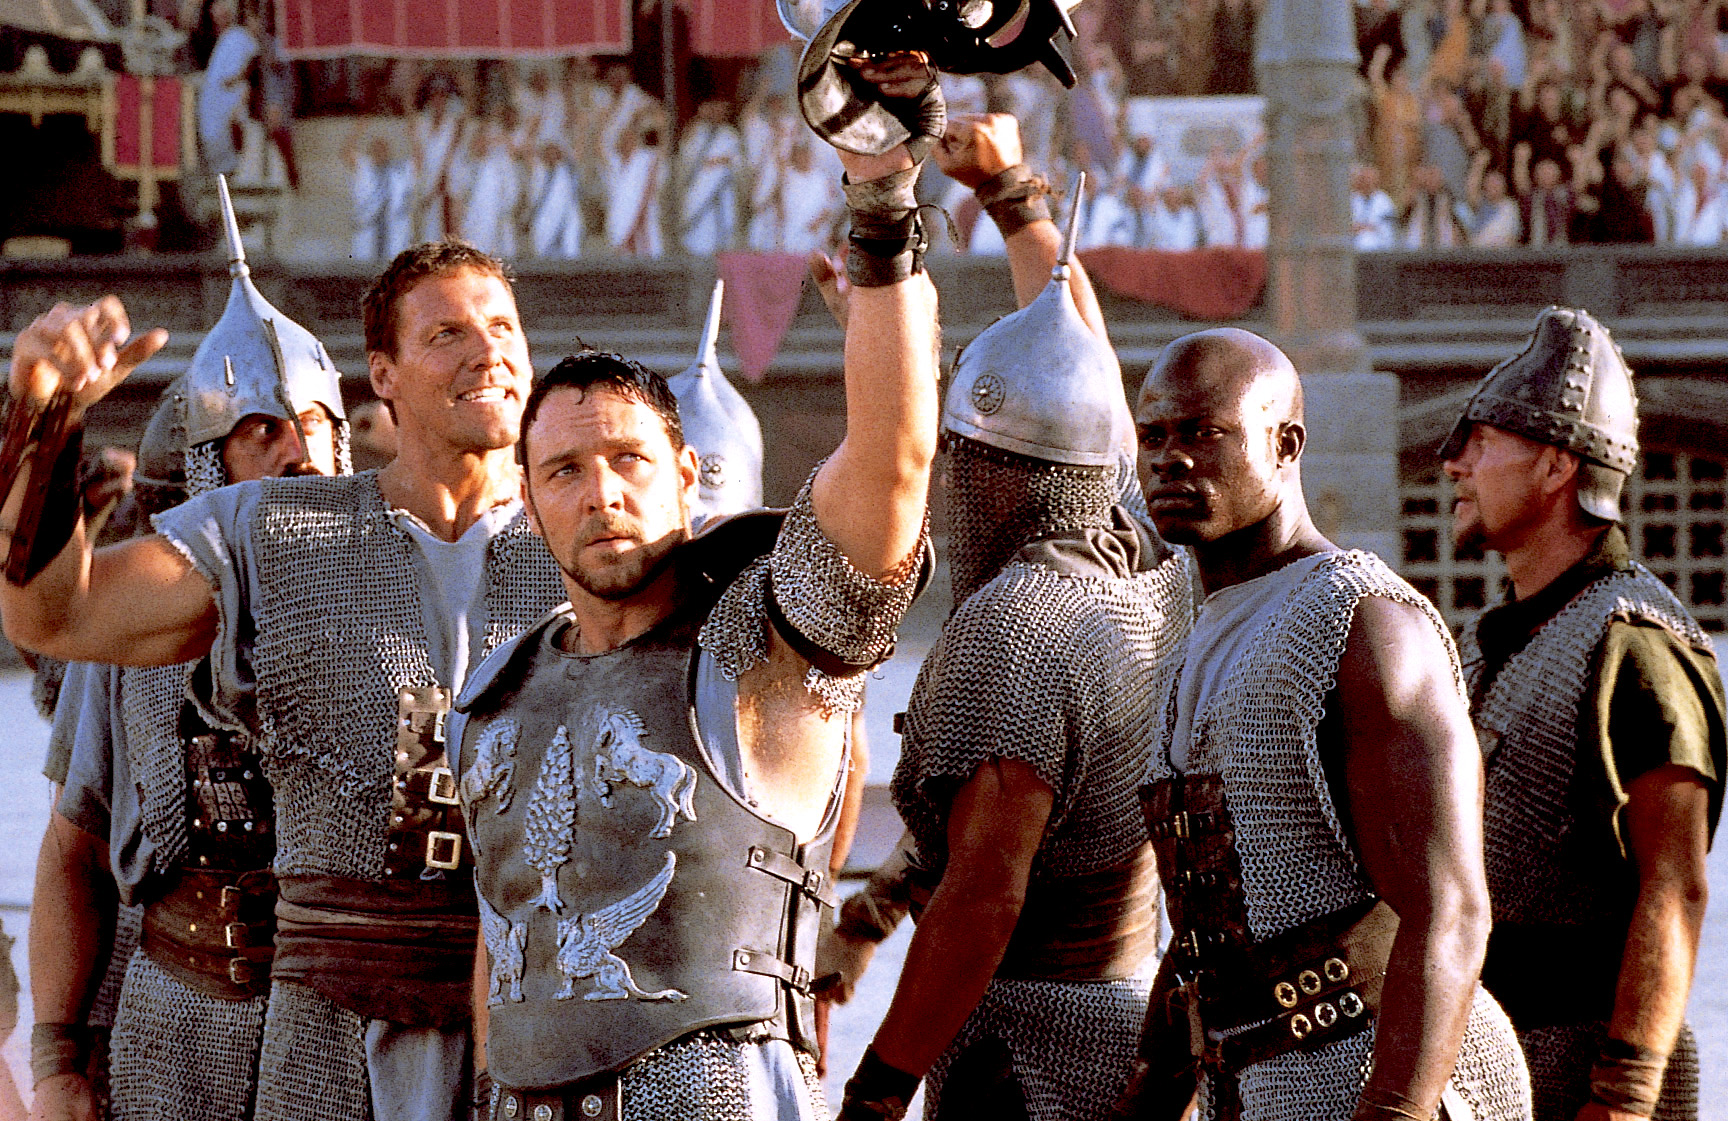 Gladiator - victory